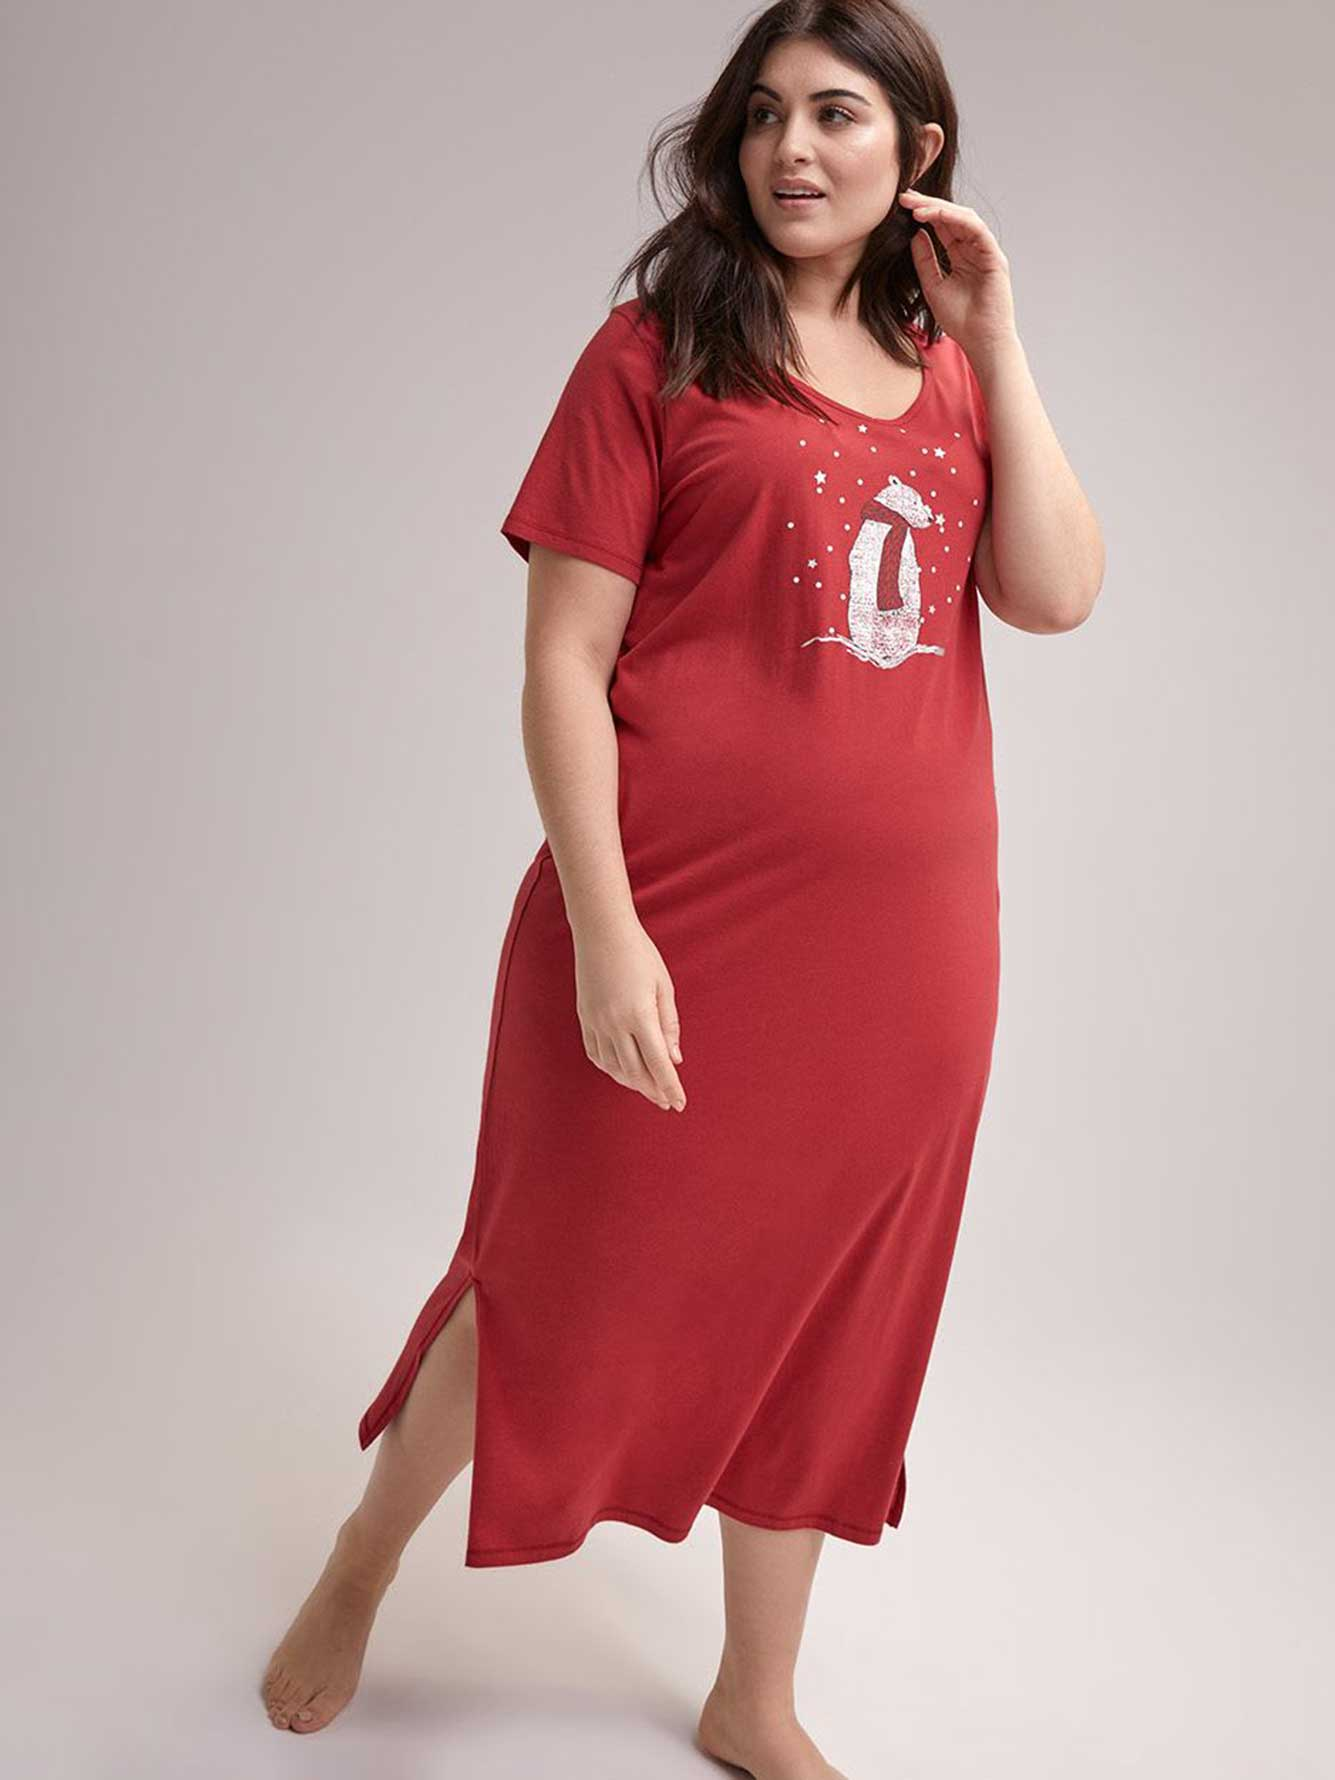 a9282222c Plus Size Clothing - Stylish   Trendy Plus Size Fashions